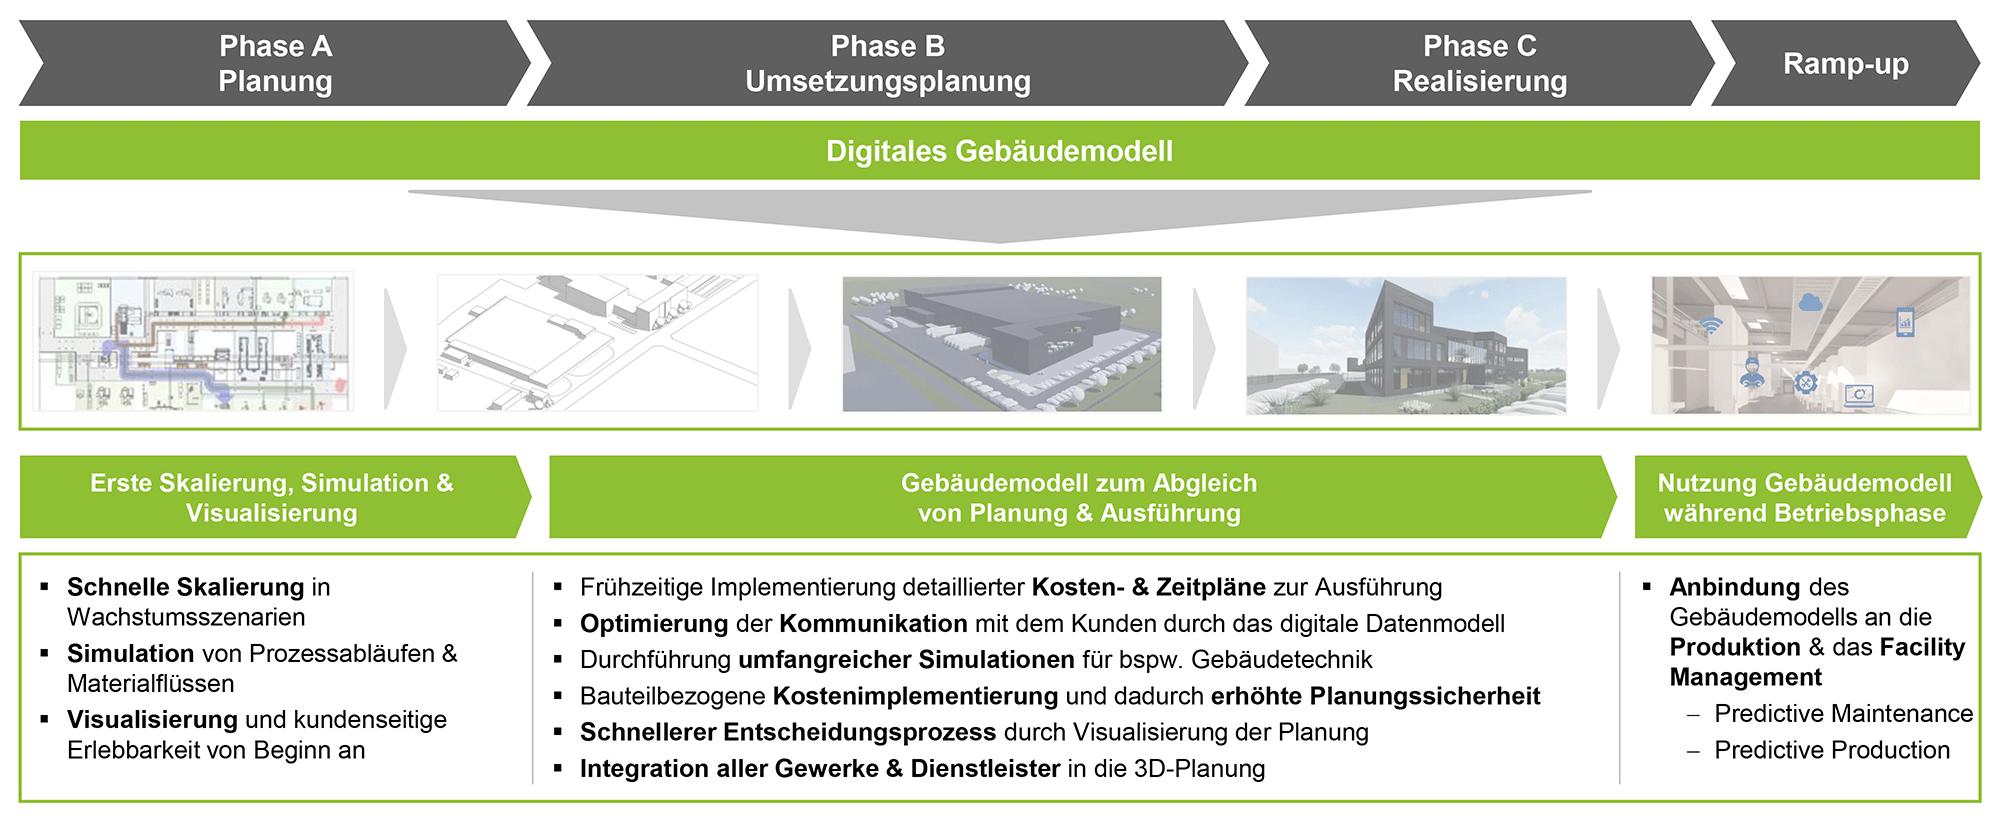 Bb_Digi-Fabrikplanung-Grafik02